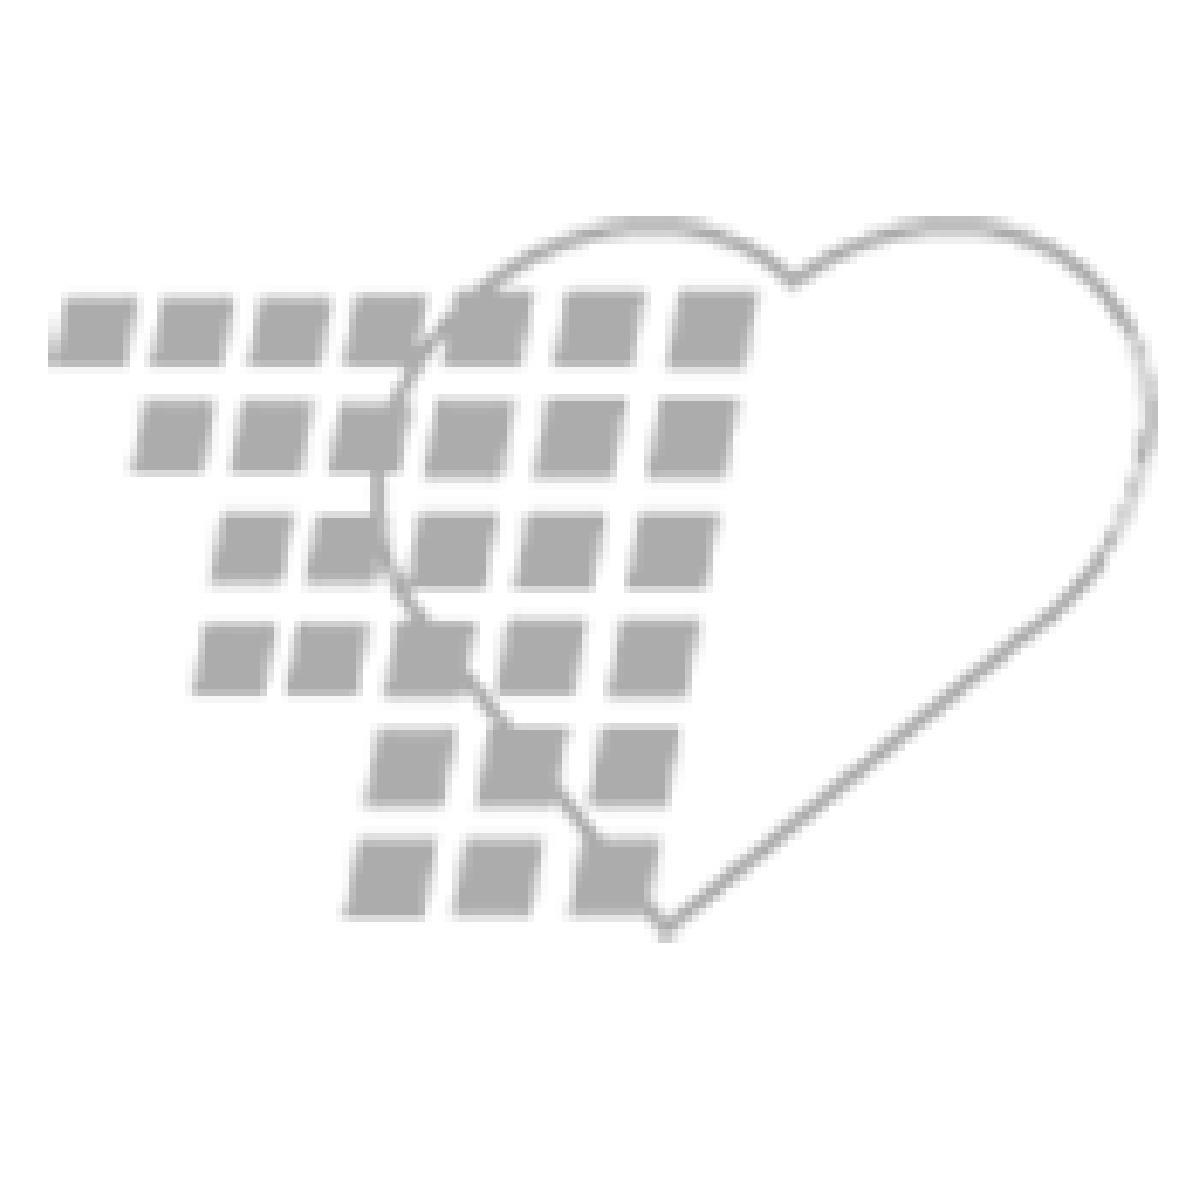 06-93-1134 - Demo Dose® Calcim Chlorid 10% 10mL